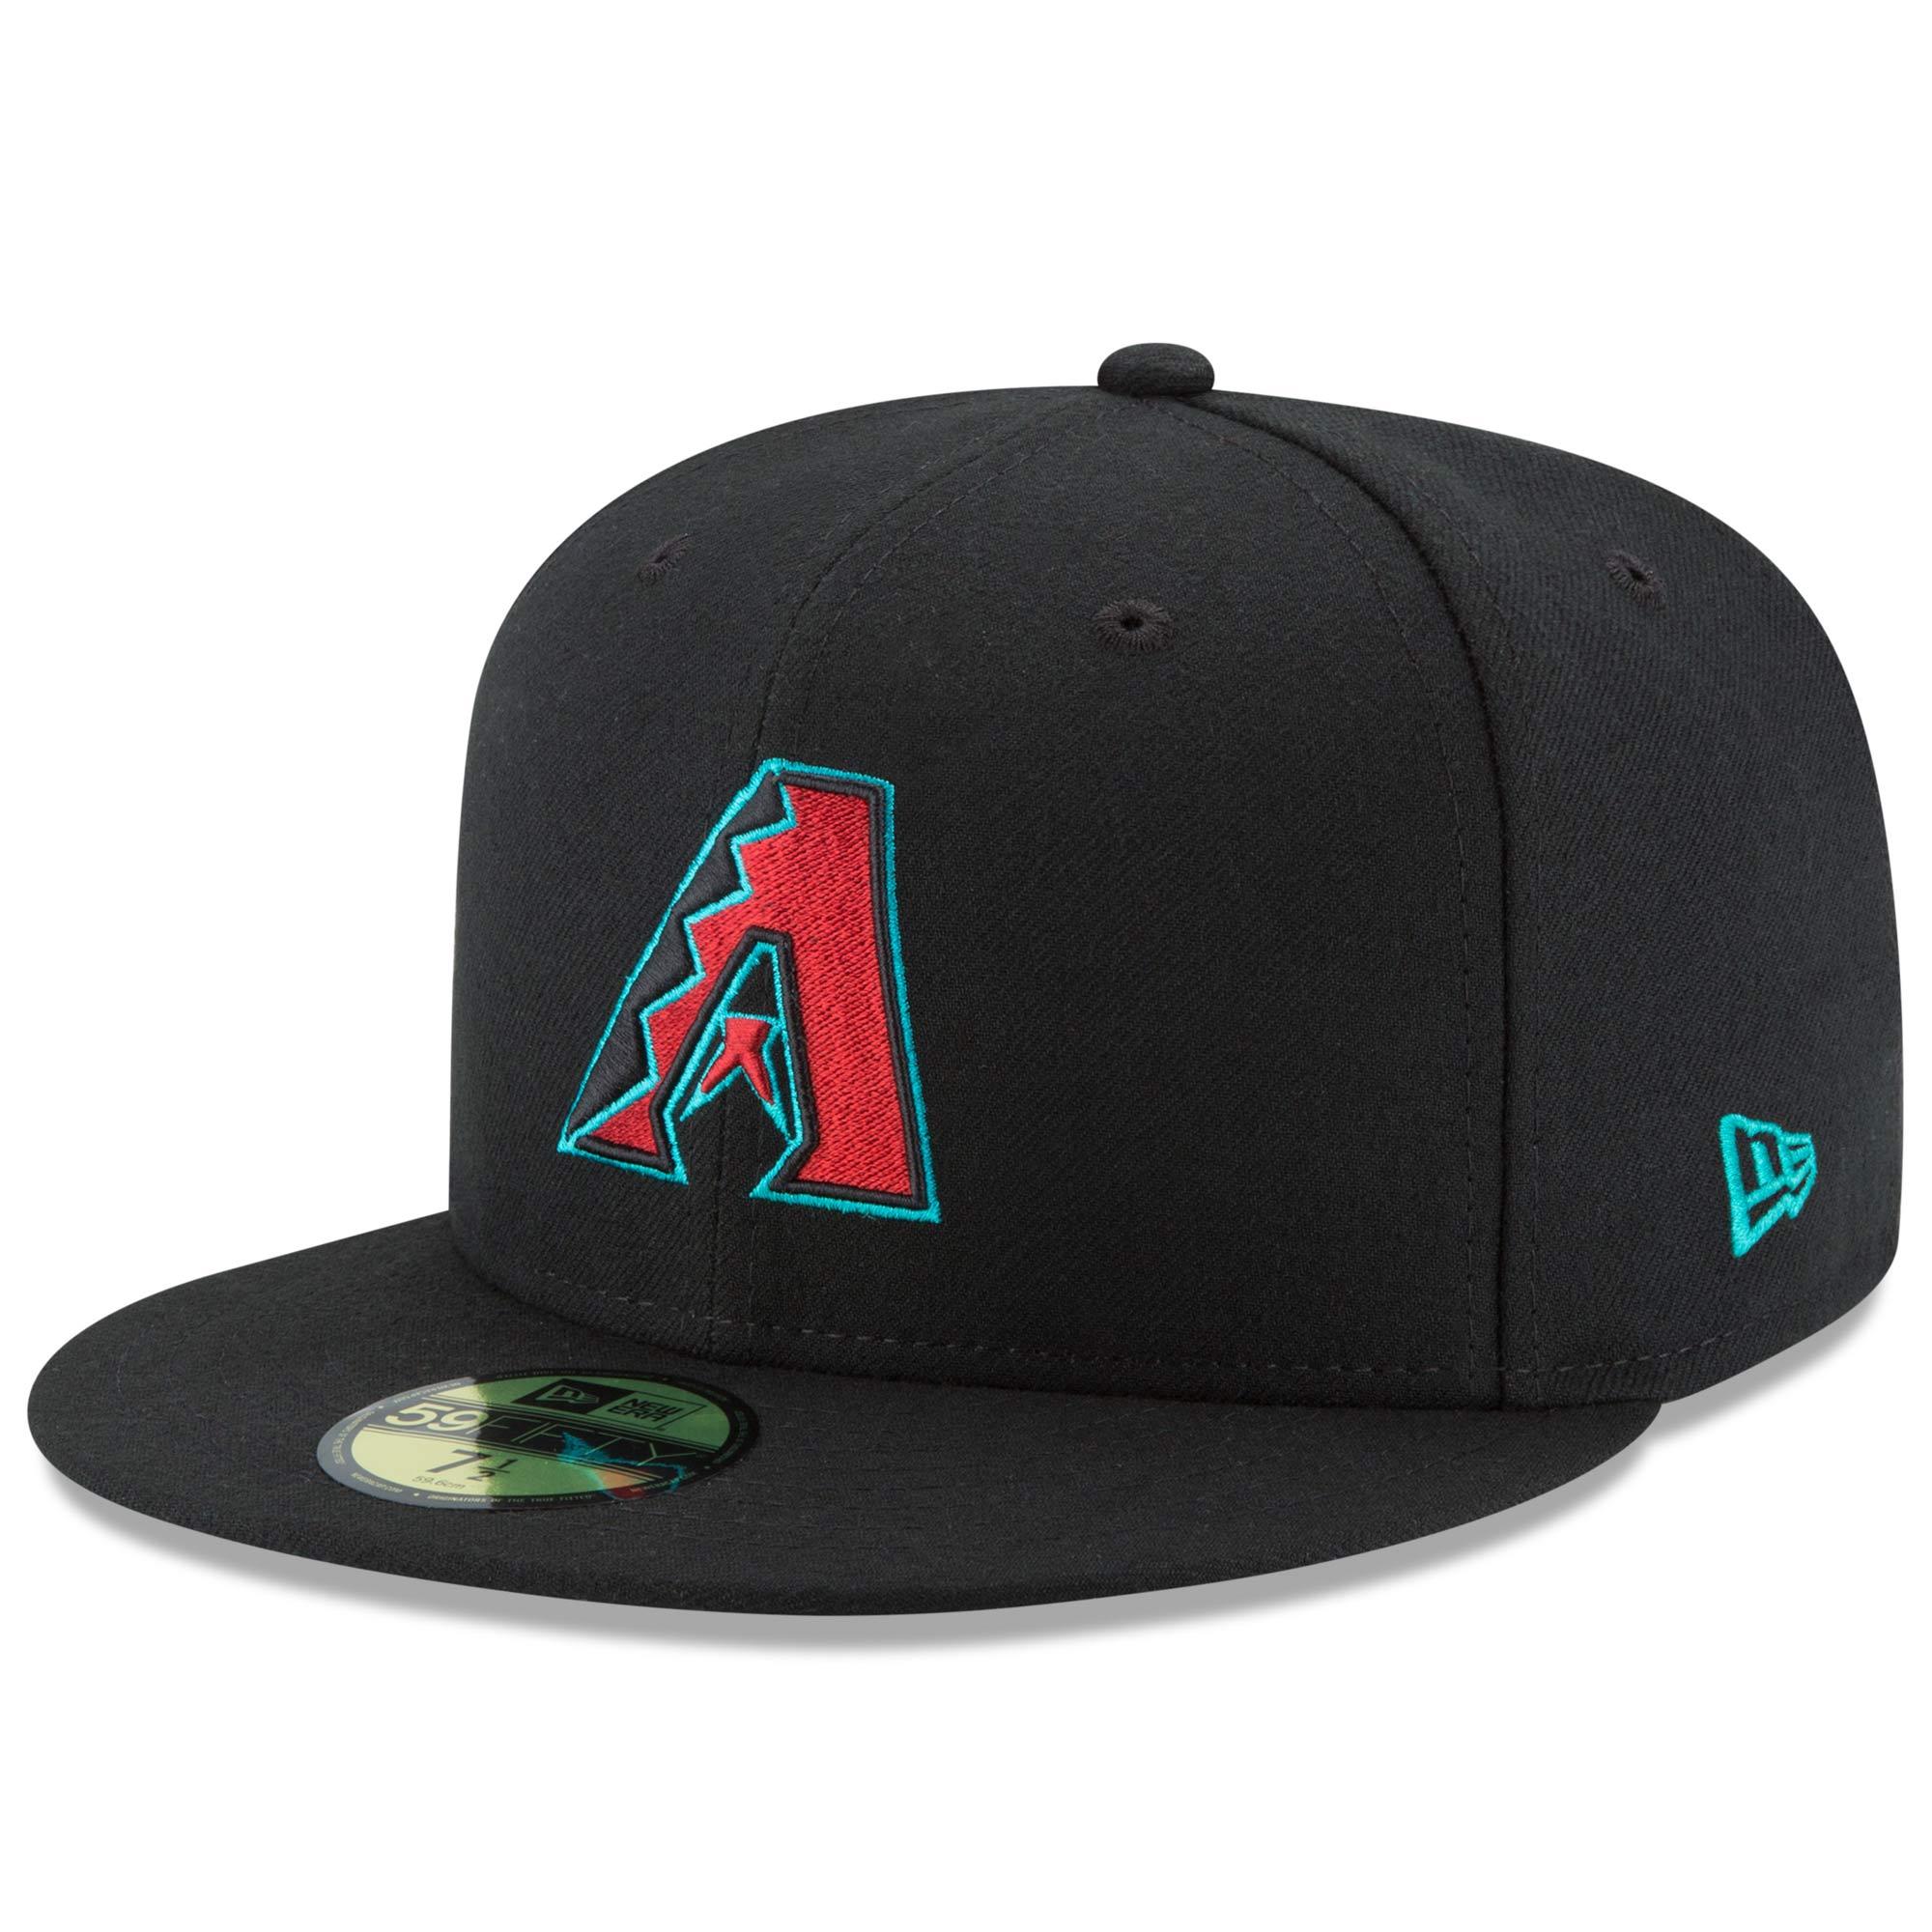 Arizona Diamondbacks New Era Alternate Authentic Collection On Field 59FIFTY Performance Fitted Hat - Black